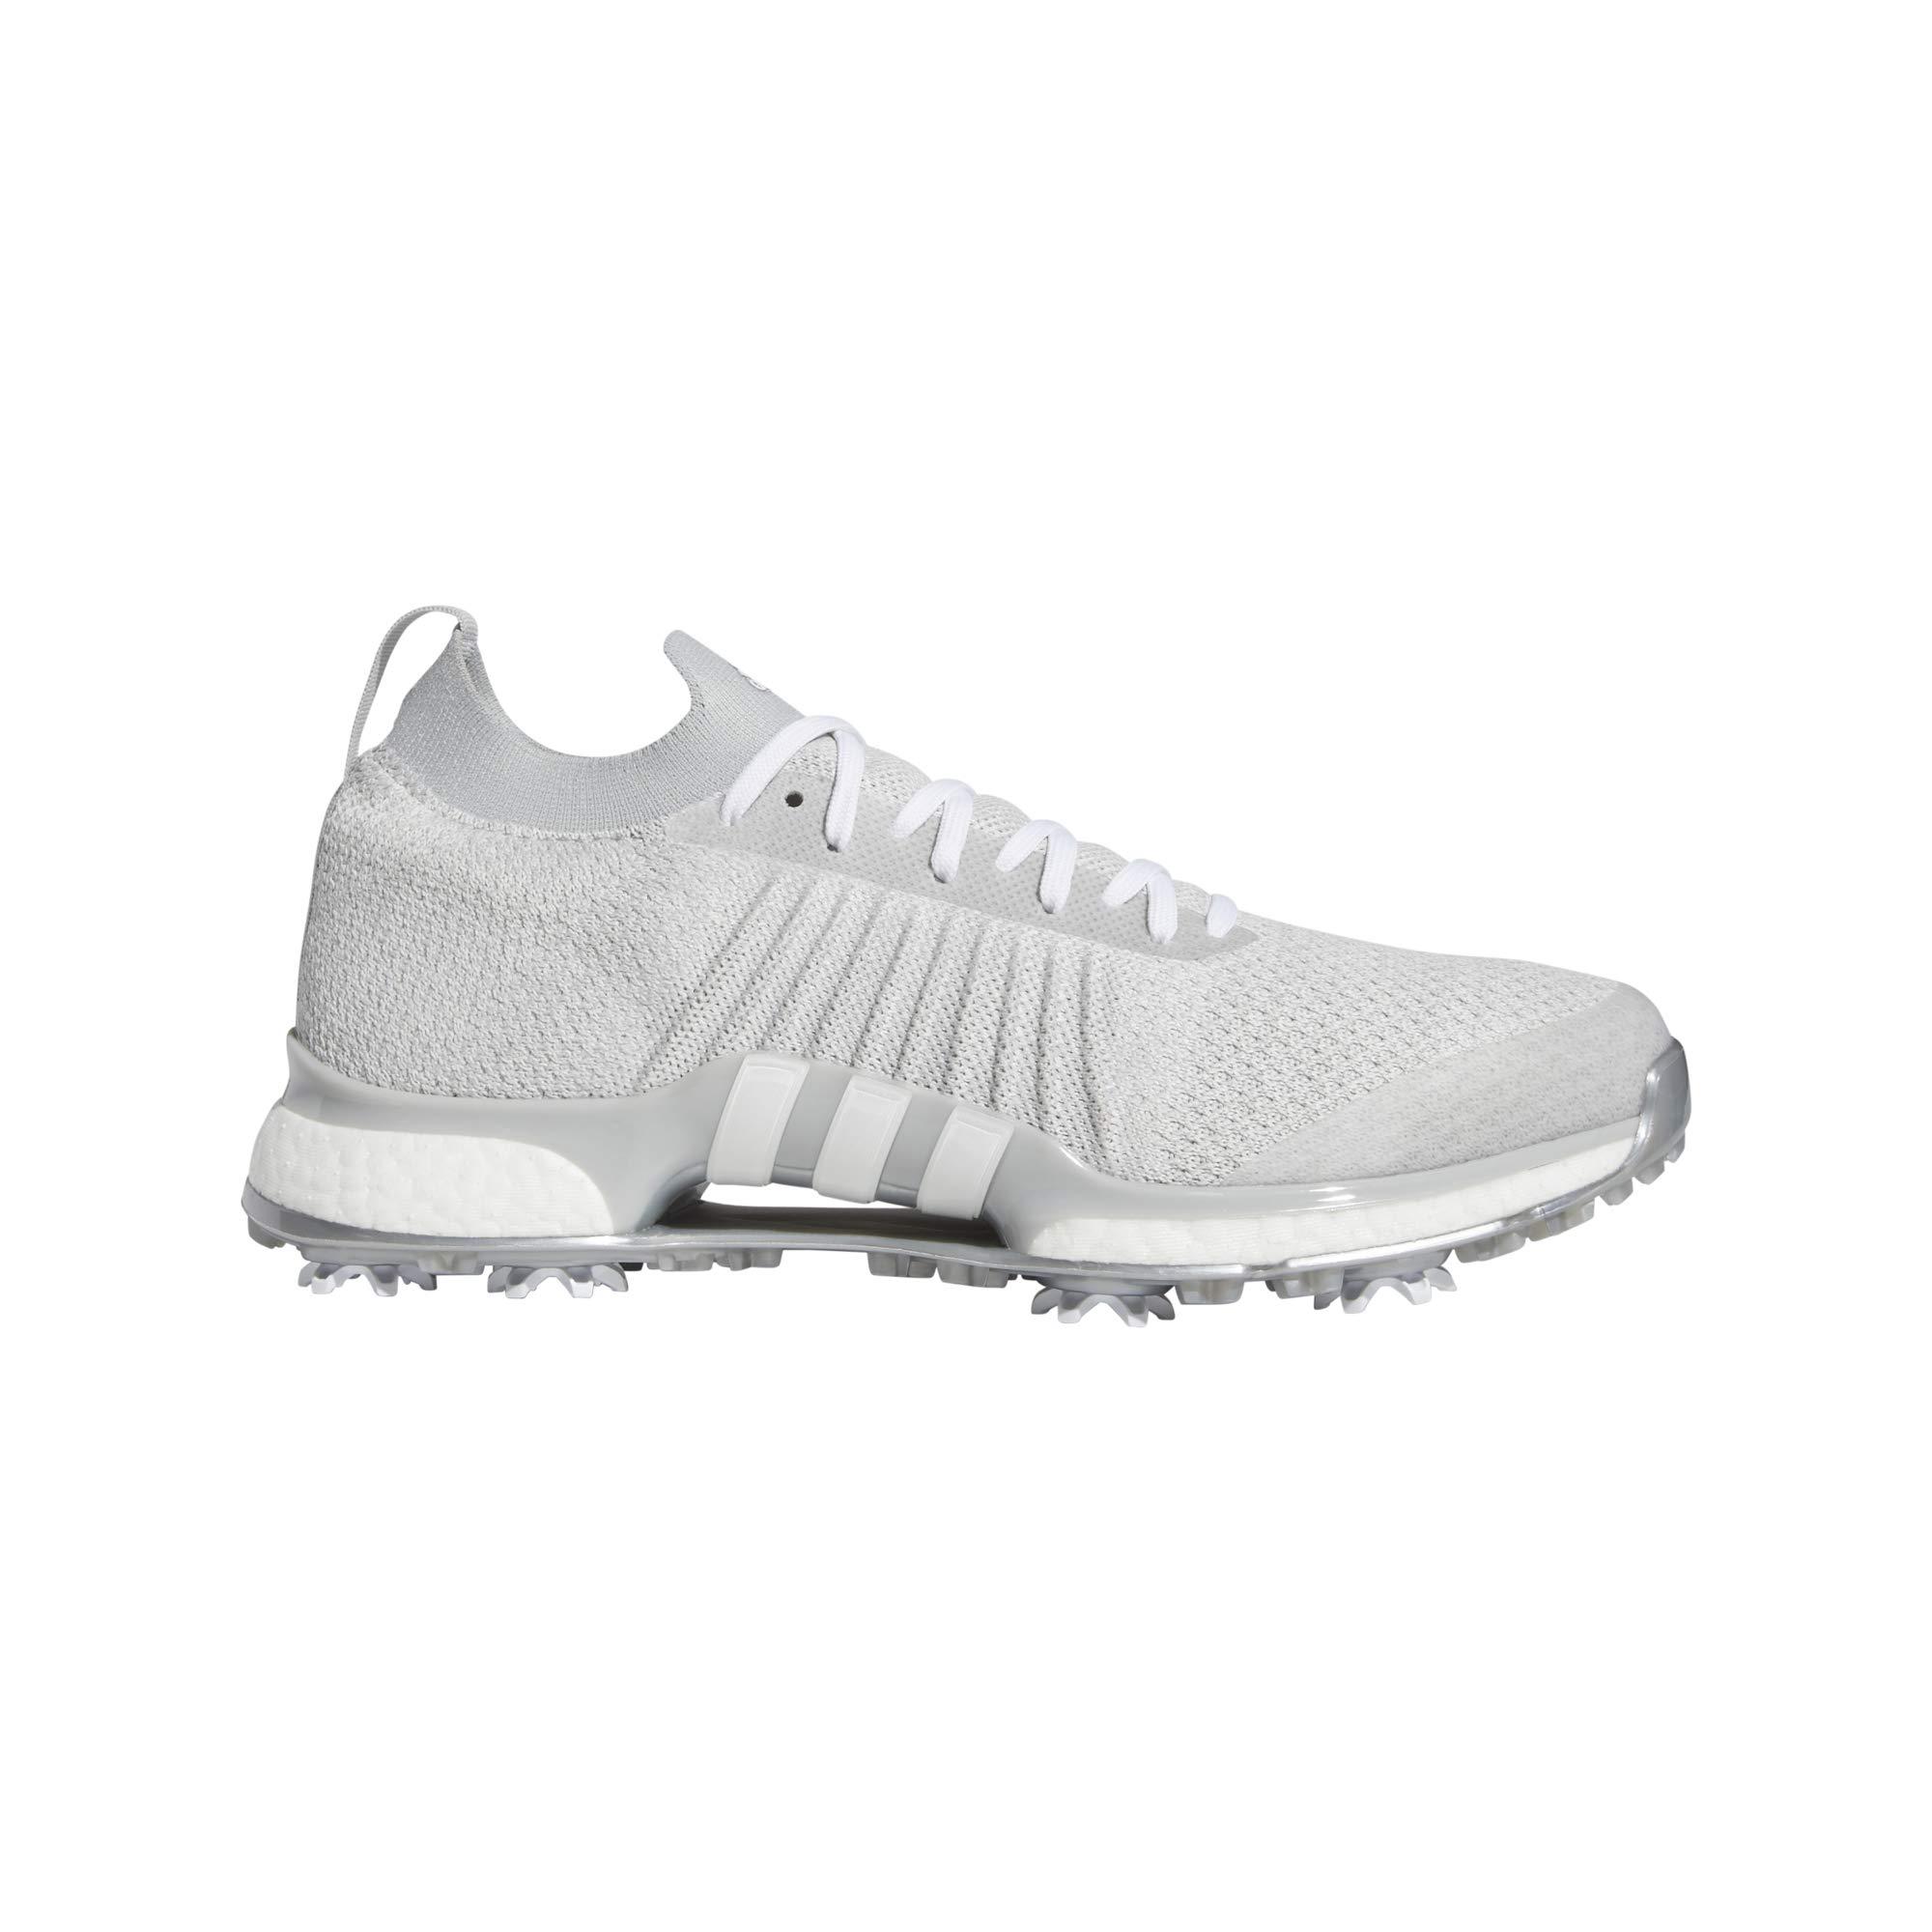 adidas Men's TOUR360 XT Primeknit Golf Shoe, Grey Two/White/Silver Metallic, 10.5 Medium US by adidas